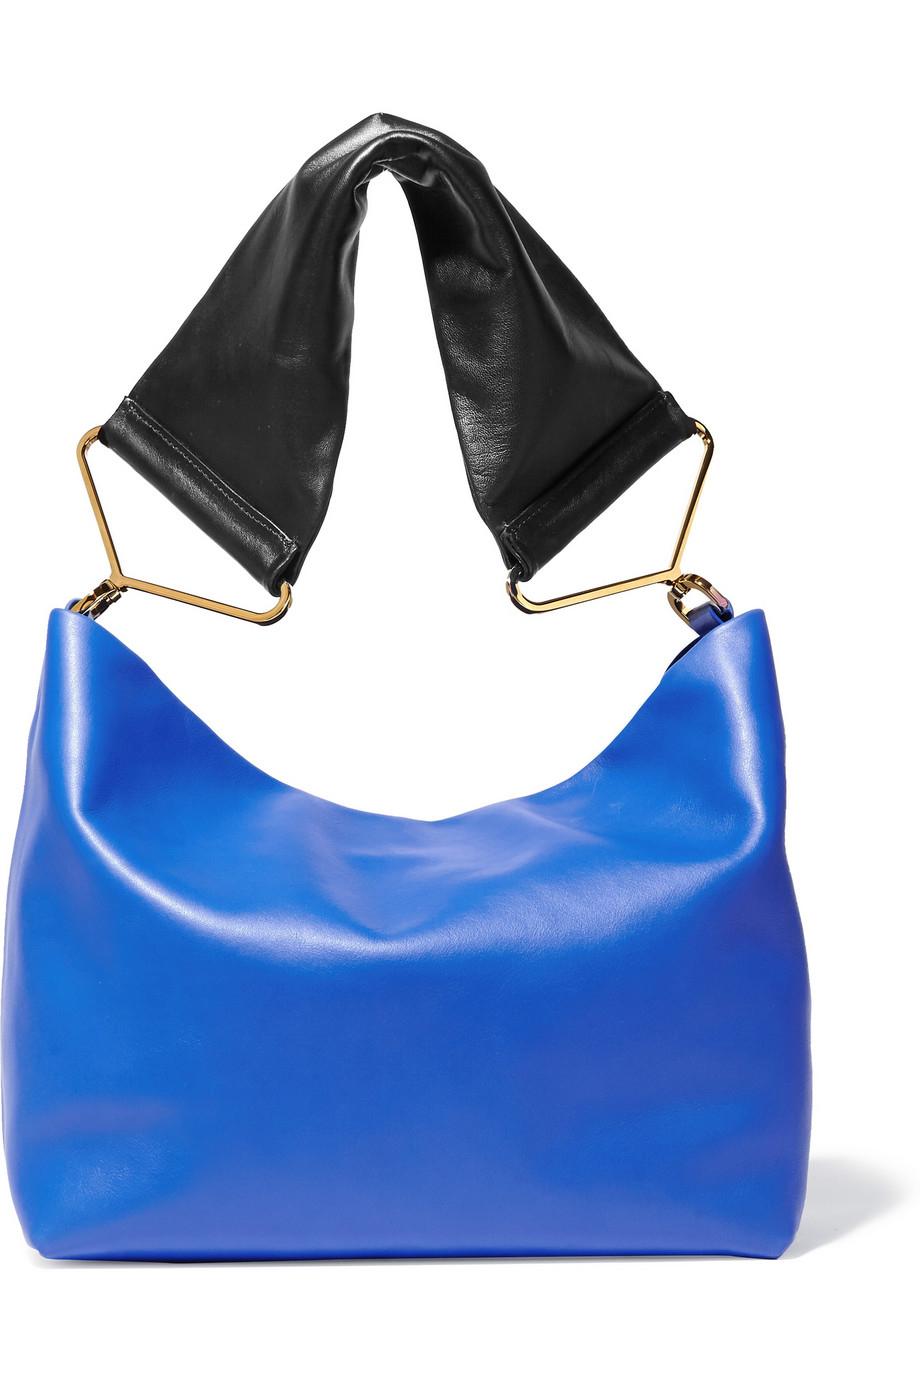 6697c159f7c5 Marni Maxi Strap Leather Shoulder Bag in Blue - Lyst